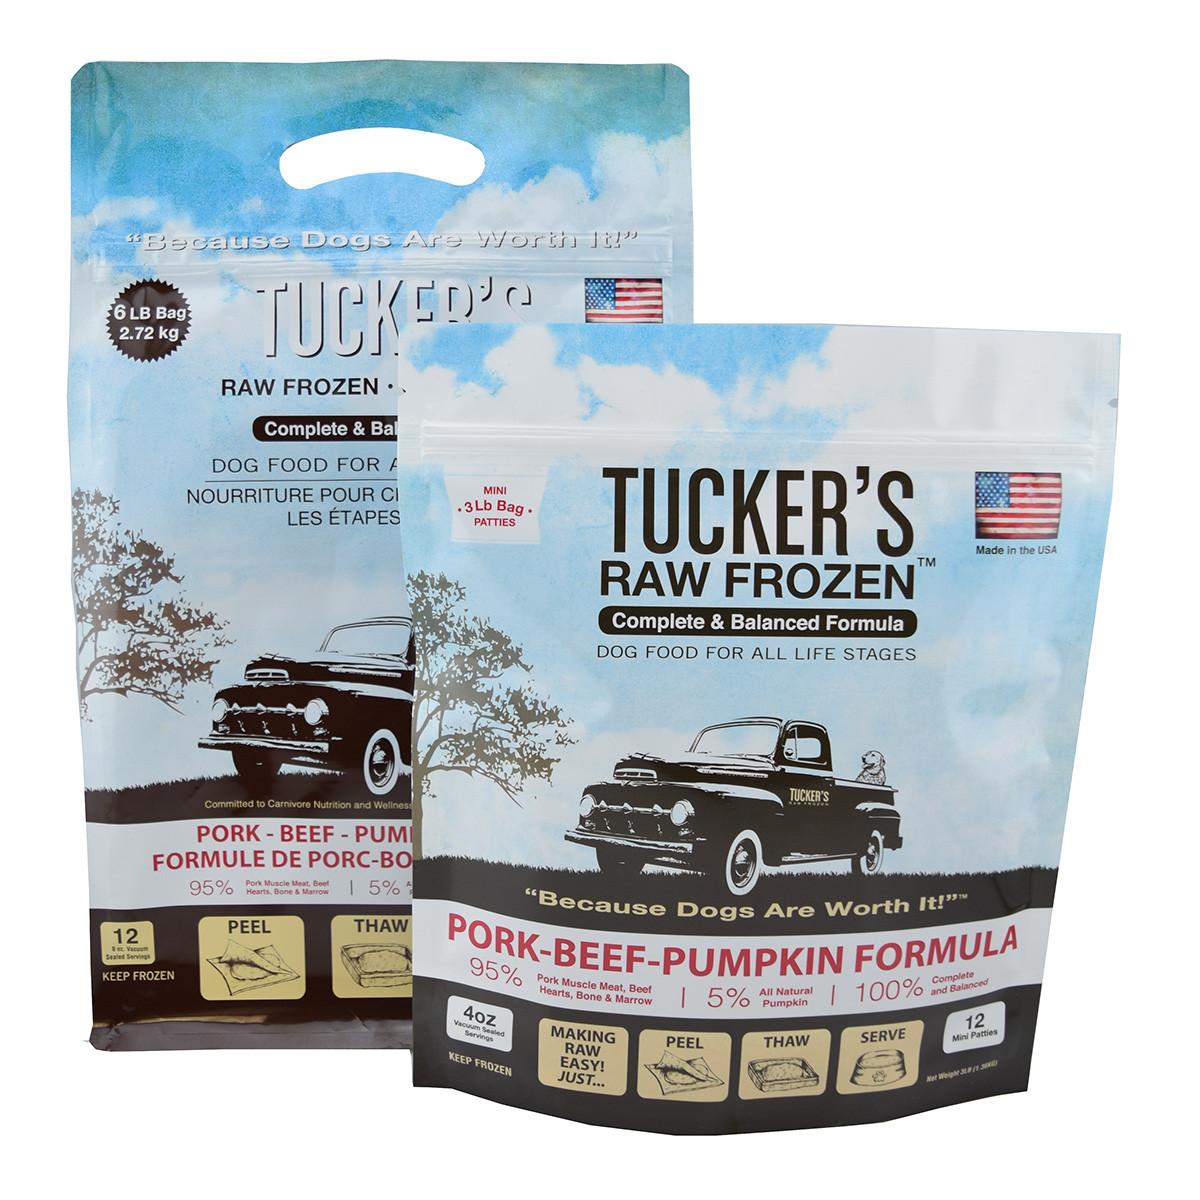 click here to shop Tucker's Raw Frozen Pork-Beef-Pumpkin Dog Food